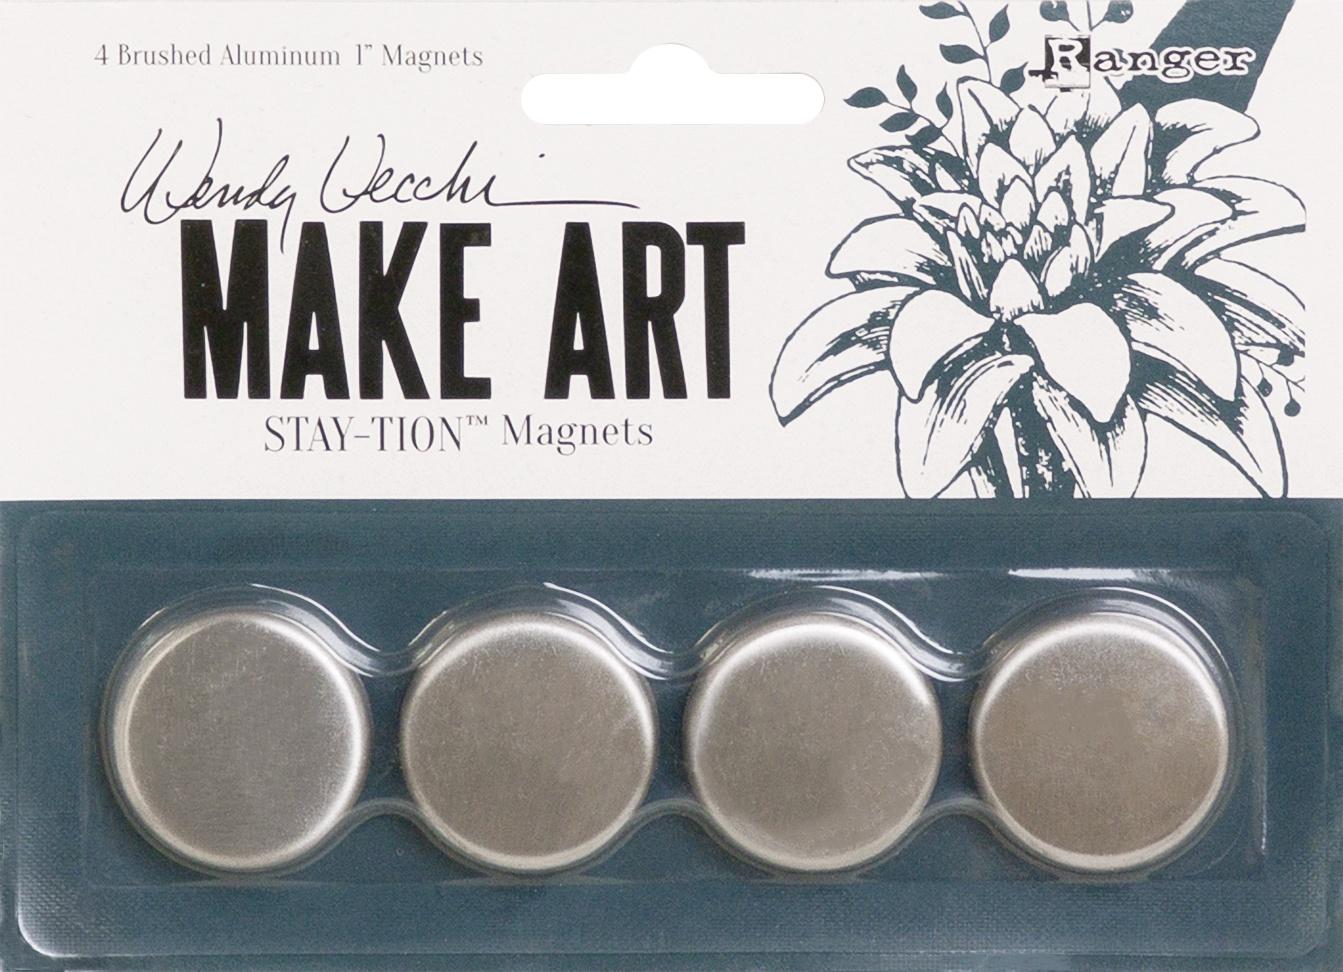 Wendy Vecchi MAKE ART Stay-tion 1 Magnets 4/Pkg-